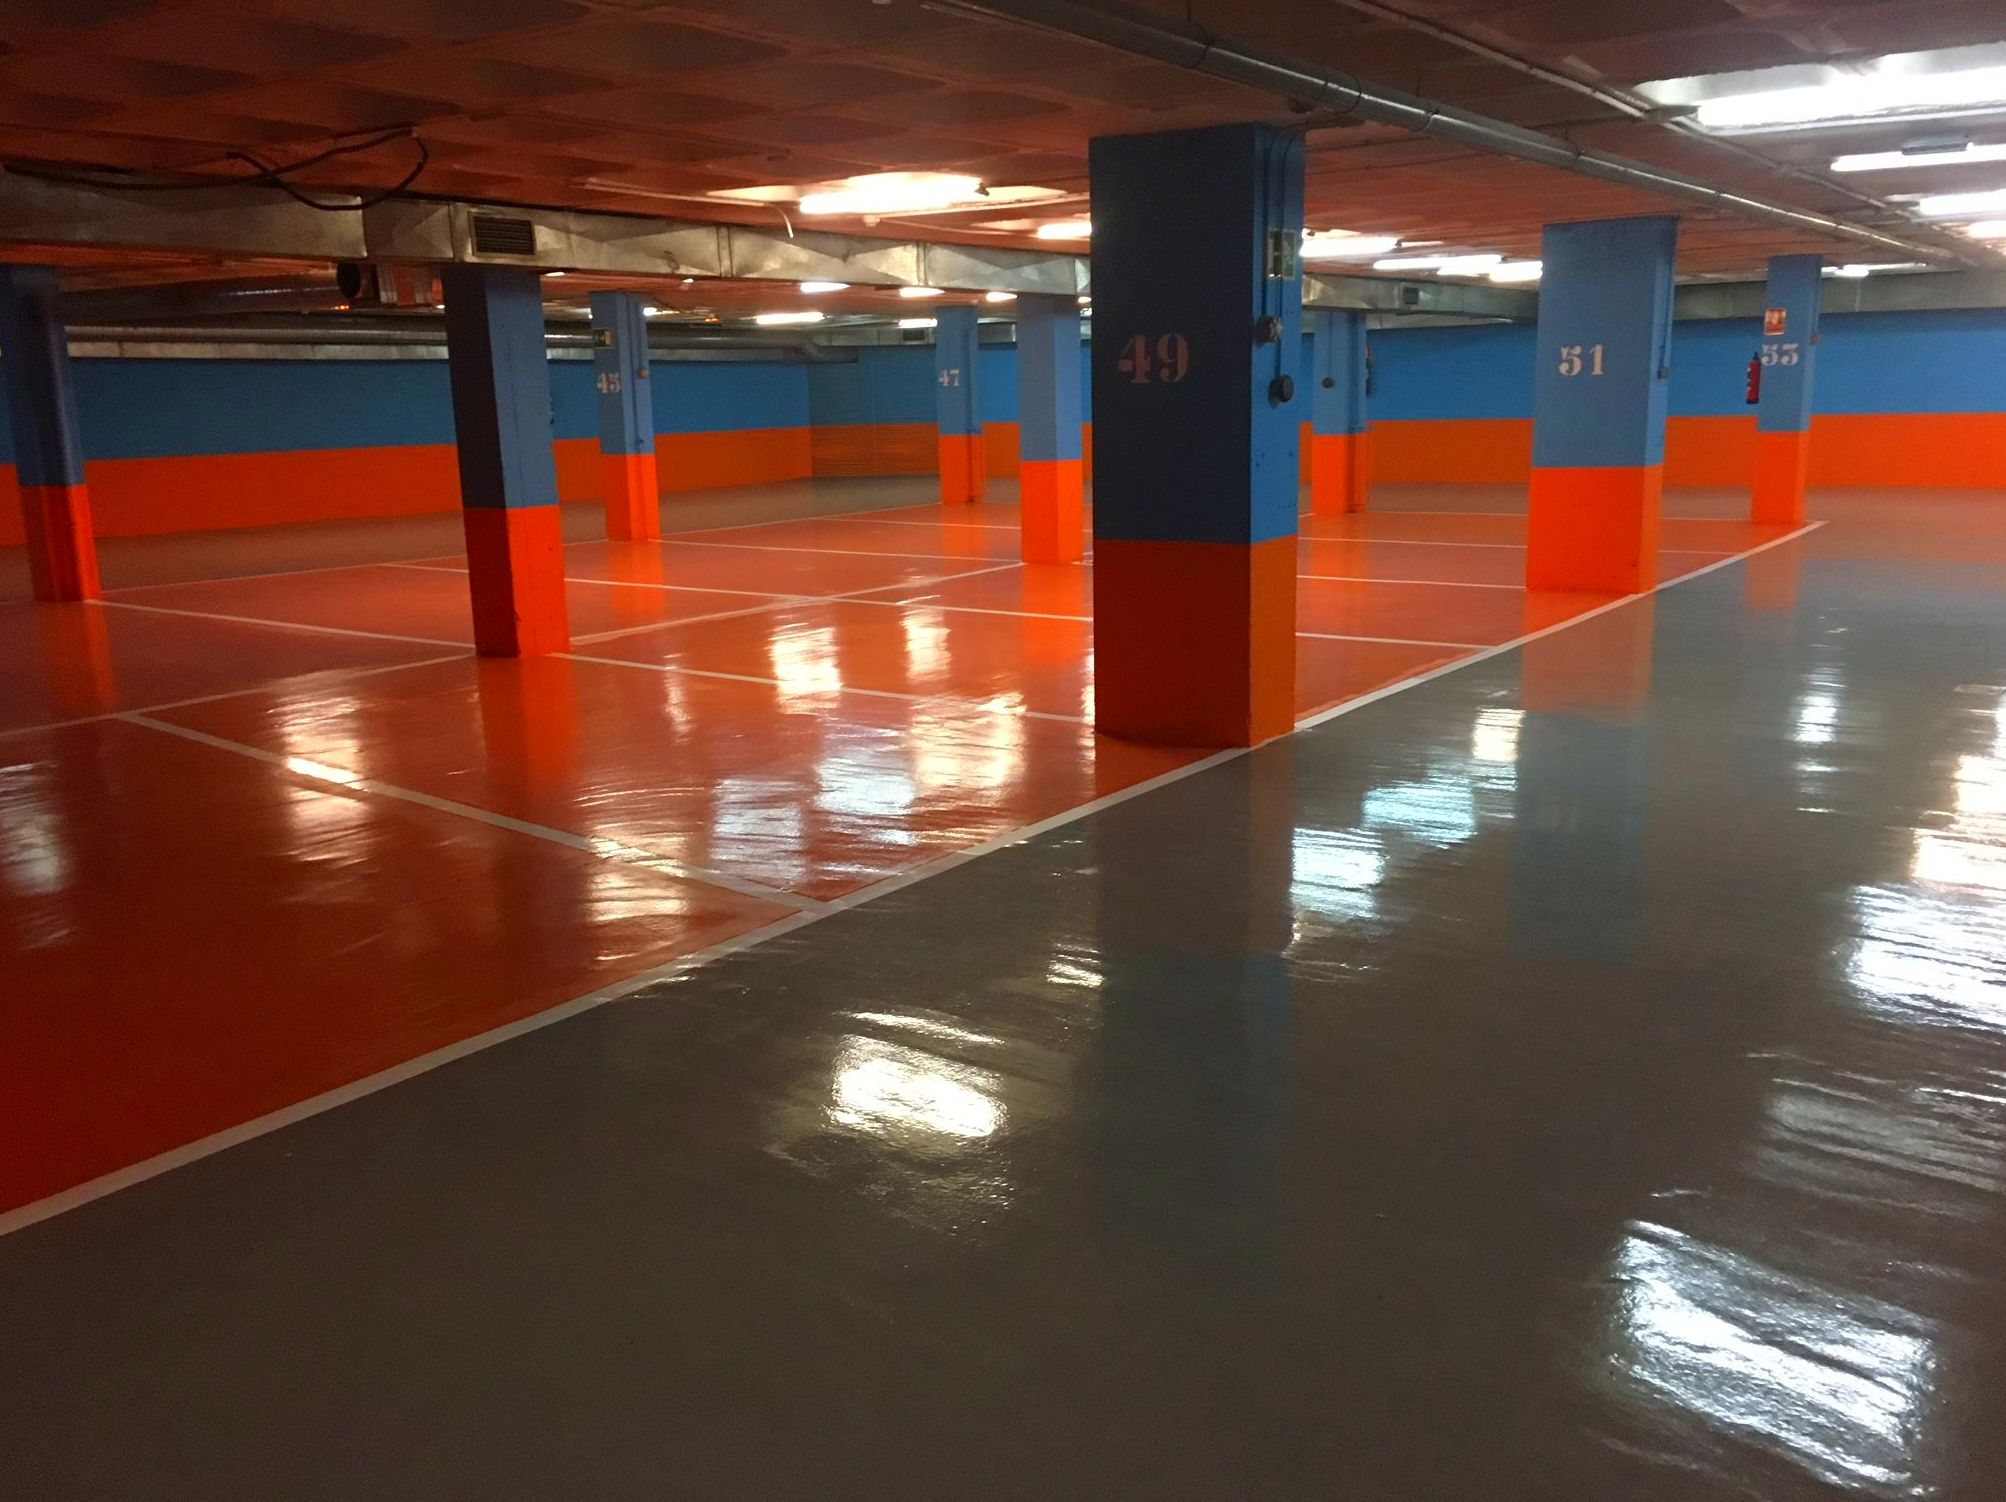 Pavimento auntonivelante cementoso terminado con resina epoxi alta calidad.Buen precio.